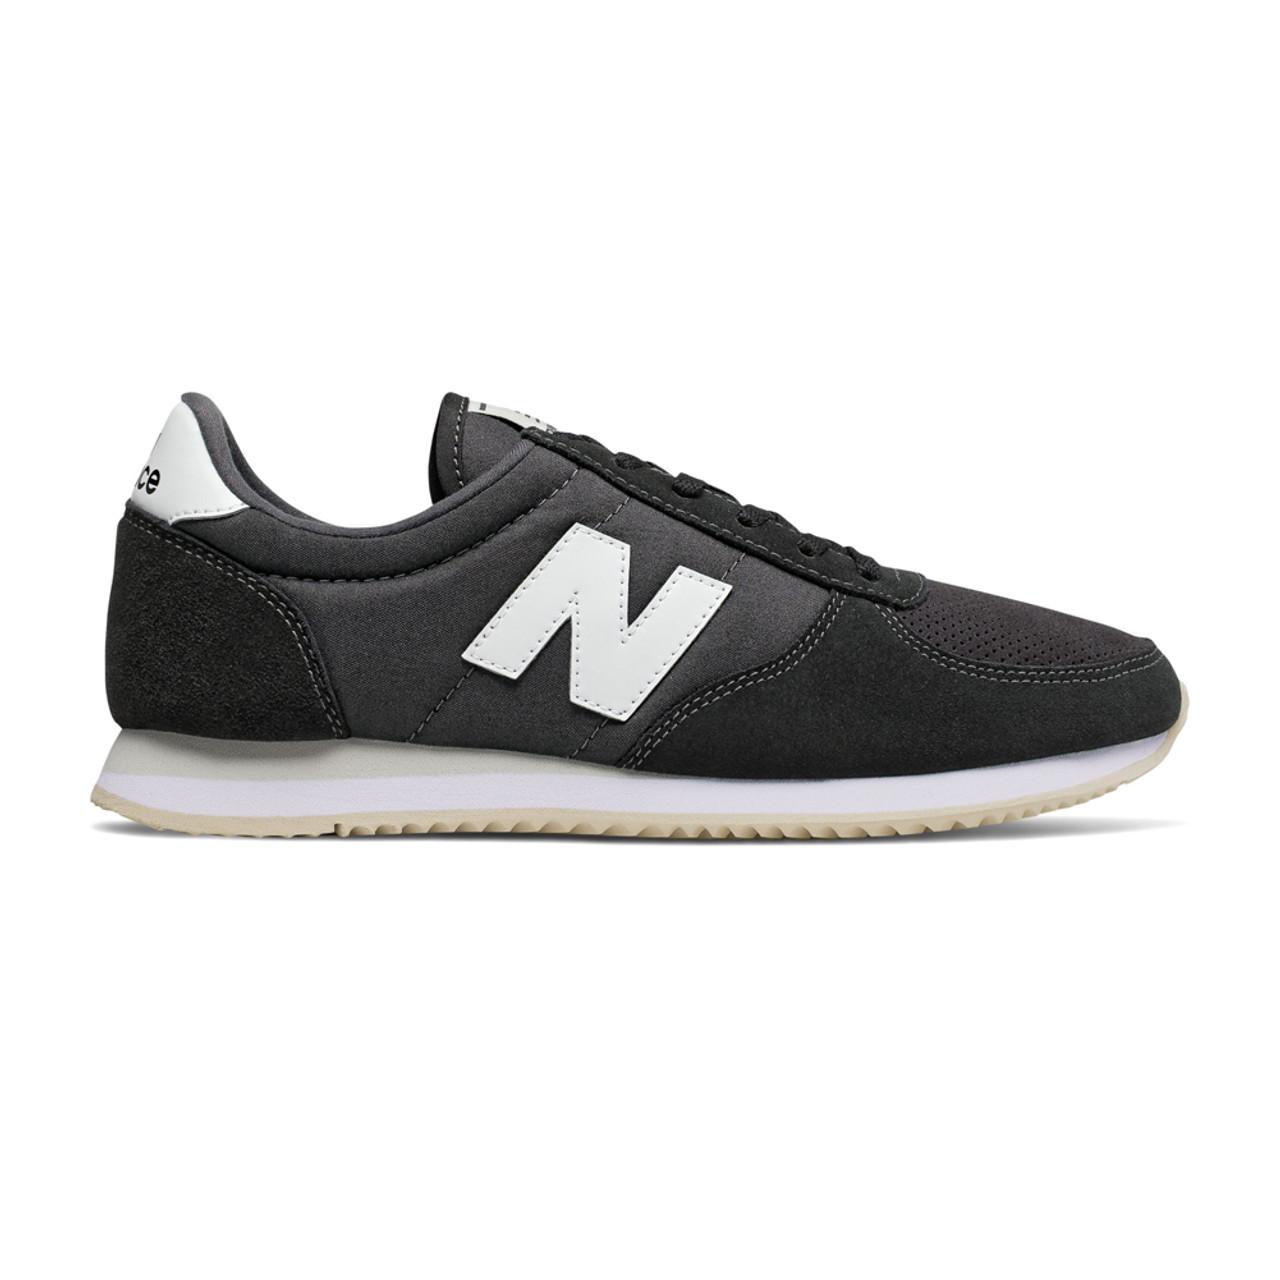 f545490ea2a New Balance Women s WL220TD Sneaker Black Magnet - Shop now   Shoolu.com